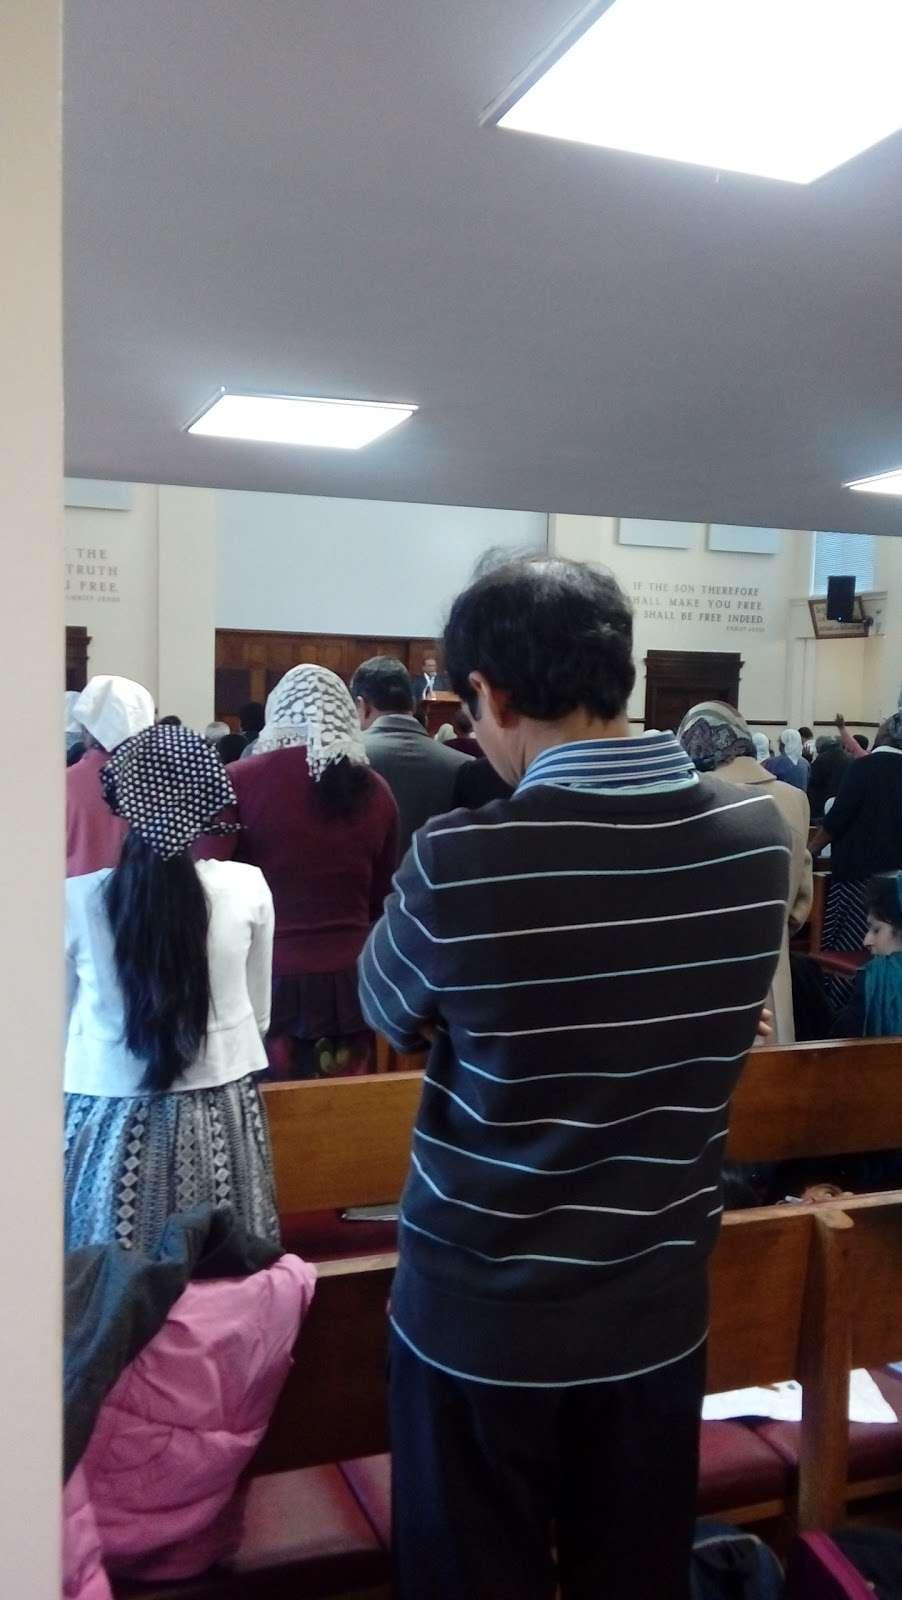 Universal Pentecostal Church - church    Photo 8 of 10   Address: 20 Acre Ln, Brixton, London SW2 5SG, UK   Phone: 020 7738 5566